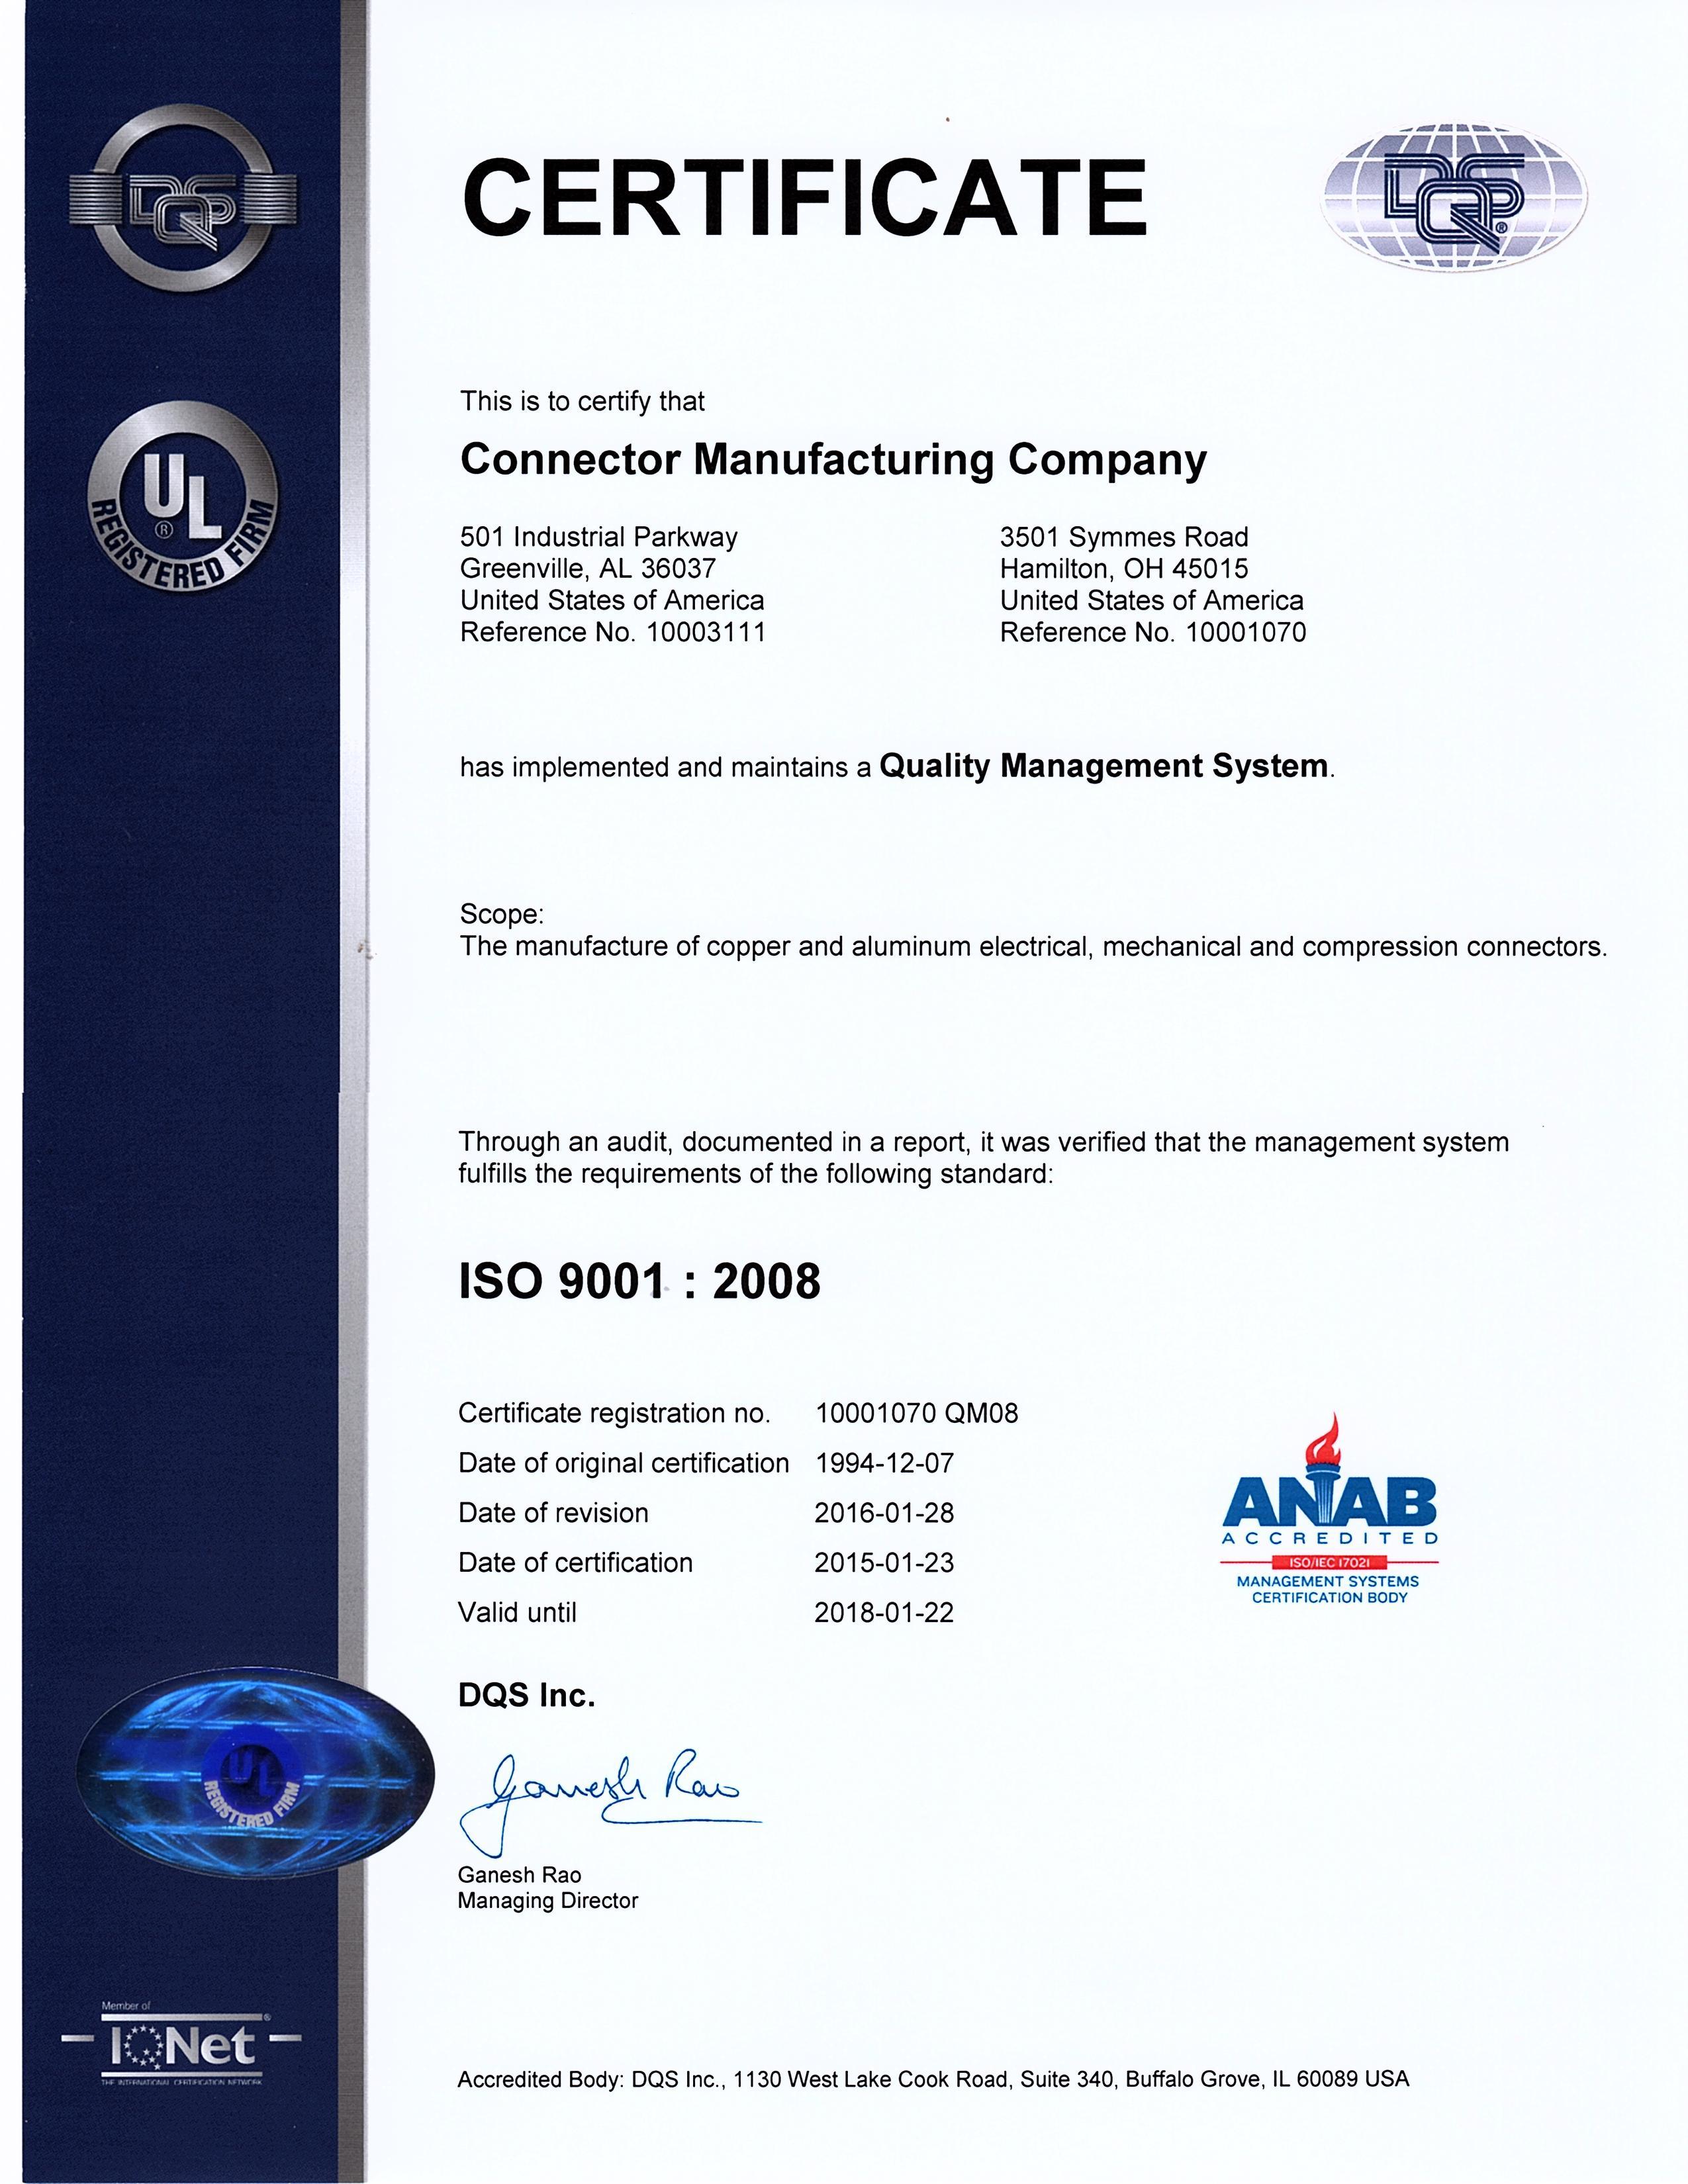 iso oktagon certification